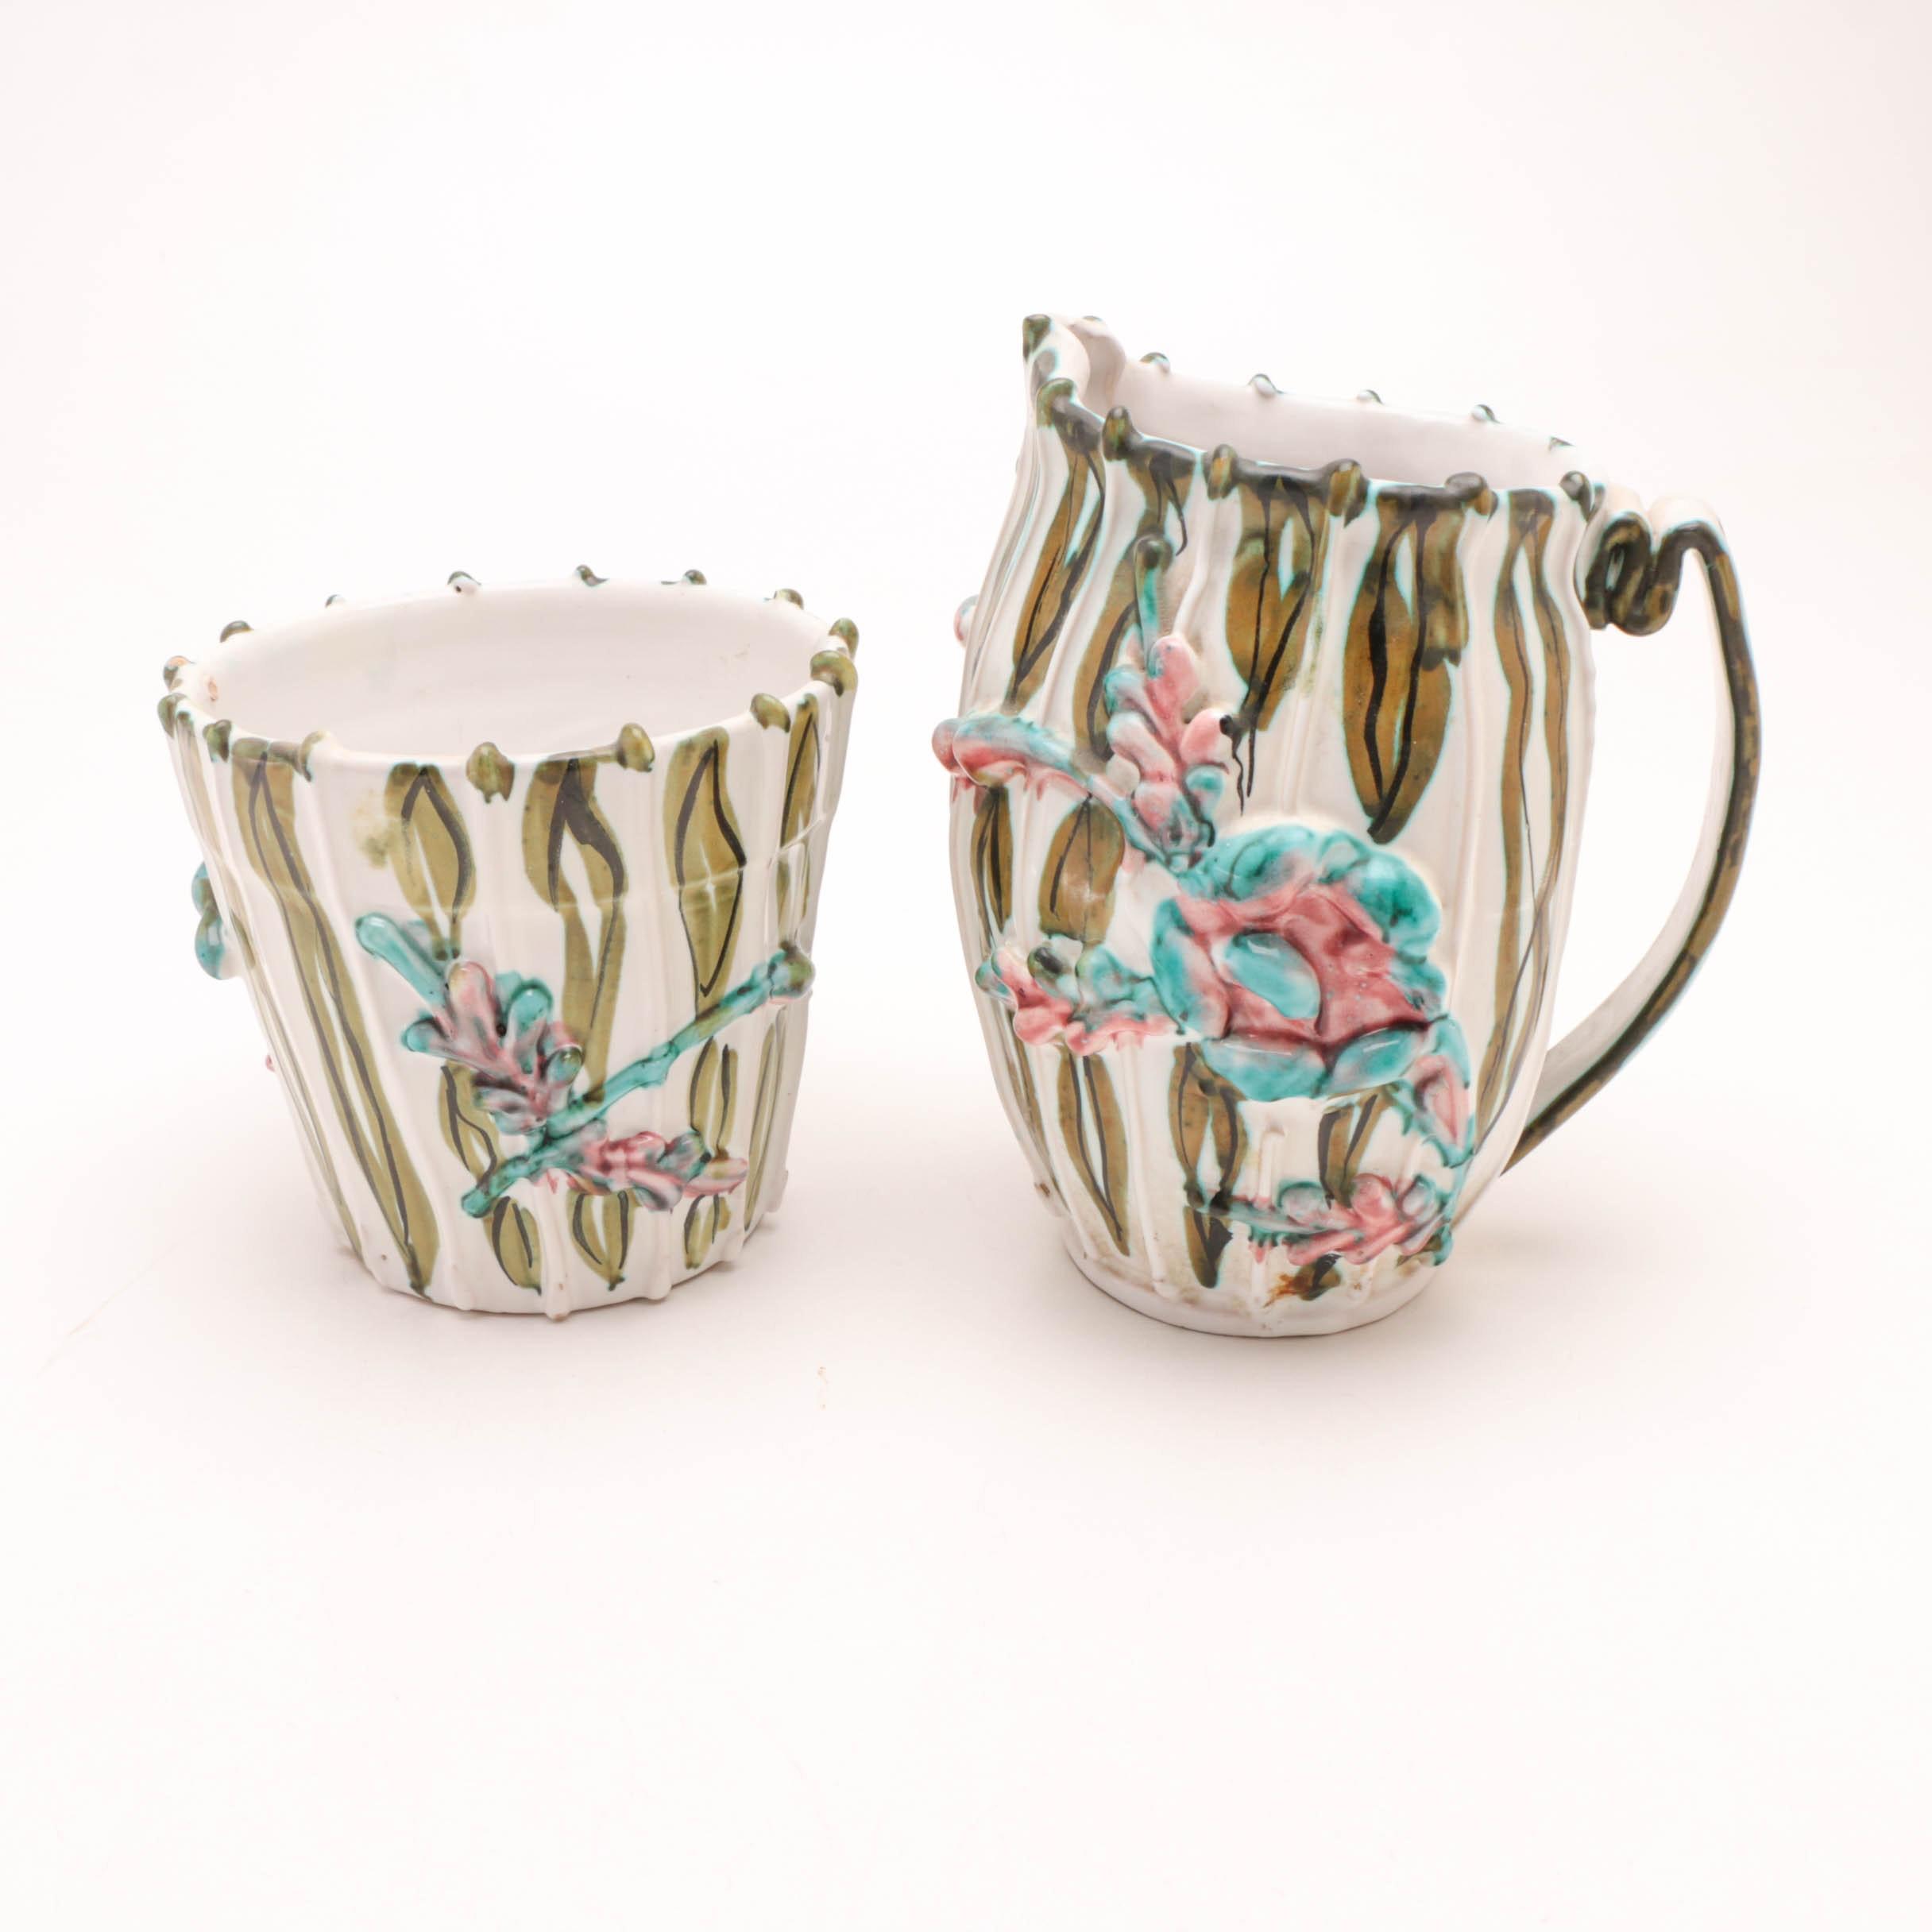 Italian Tin-Glazed Pottery Pitcher and Planting Pot